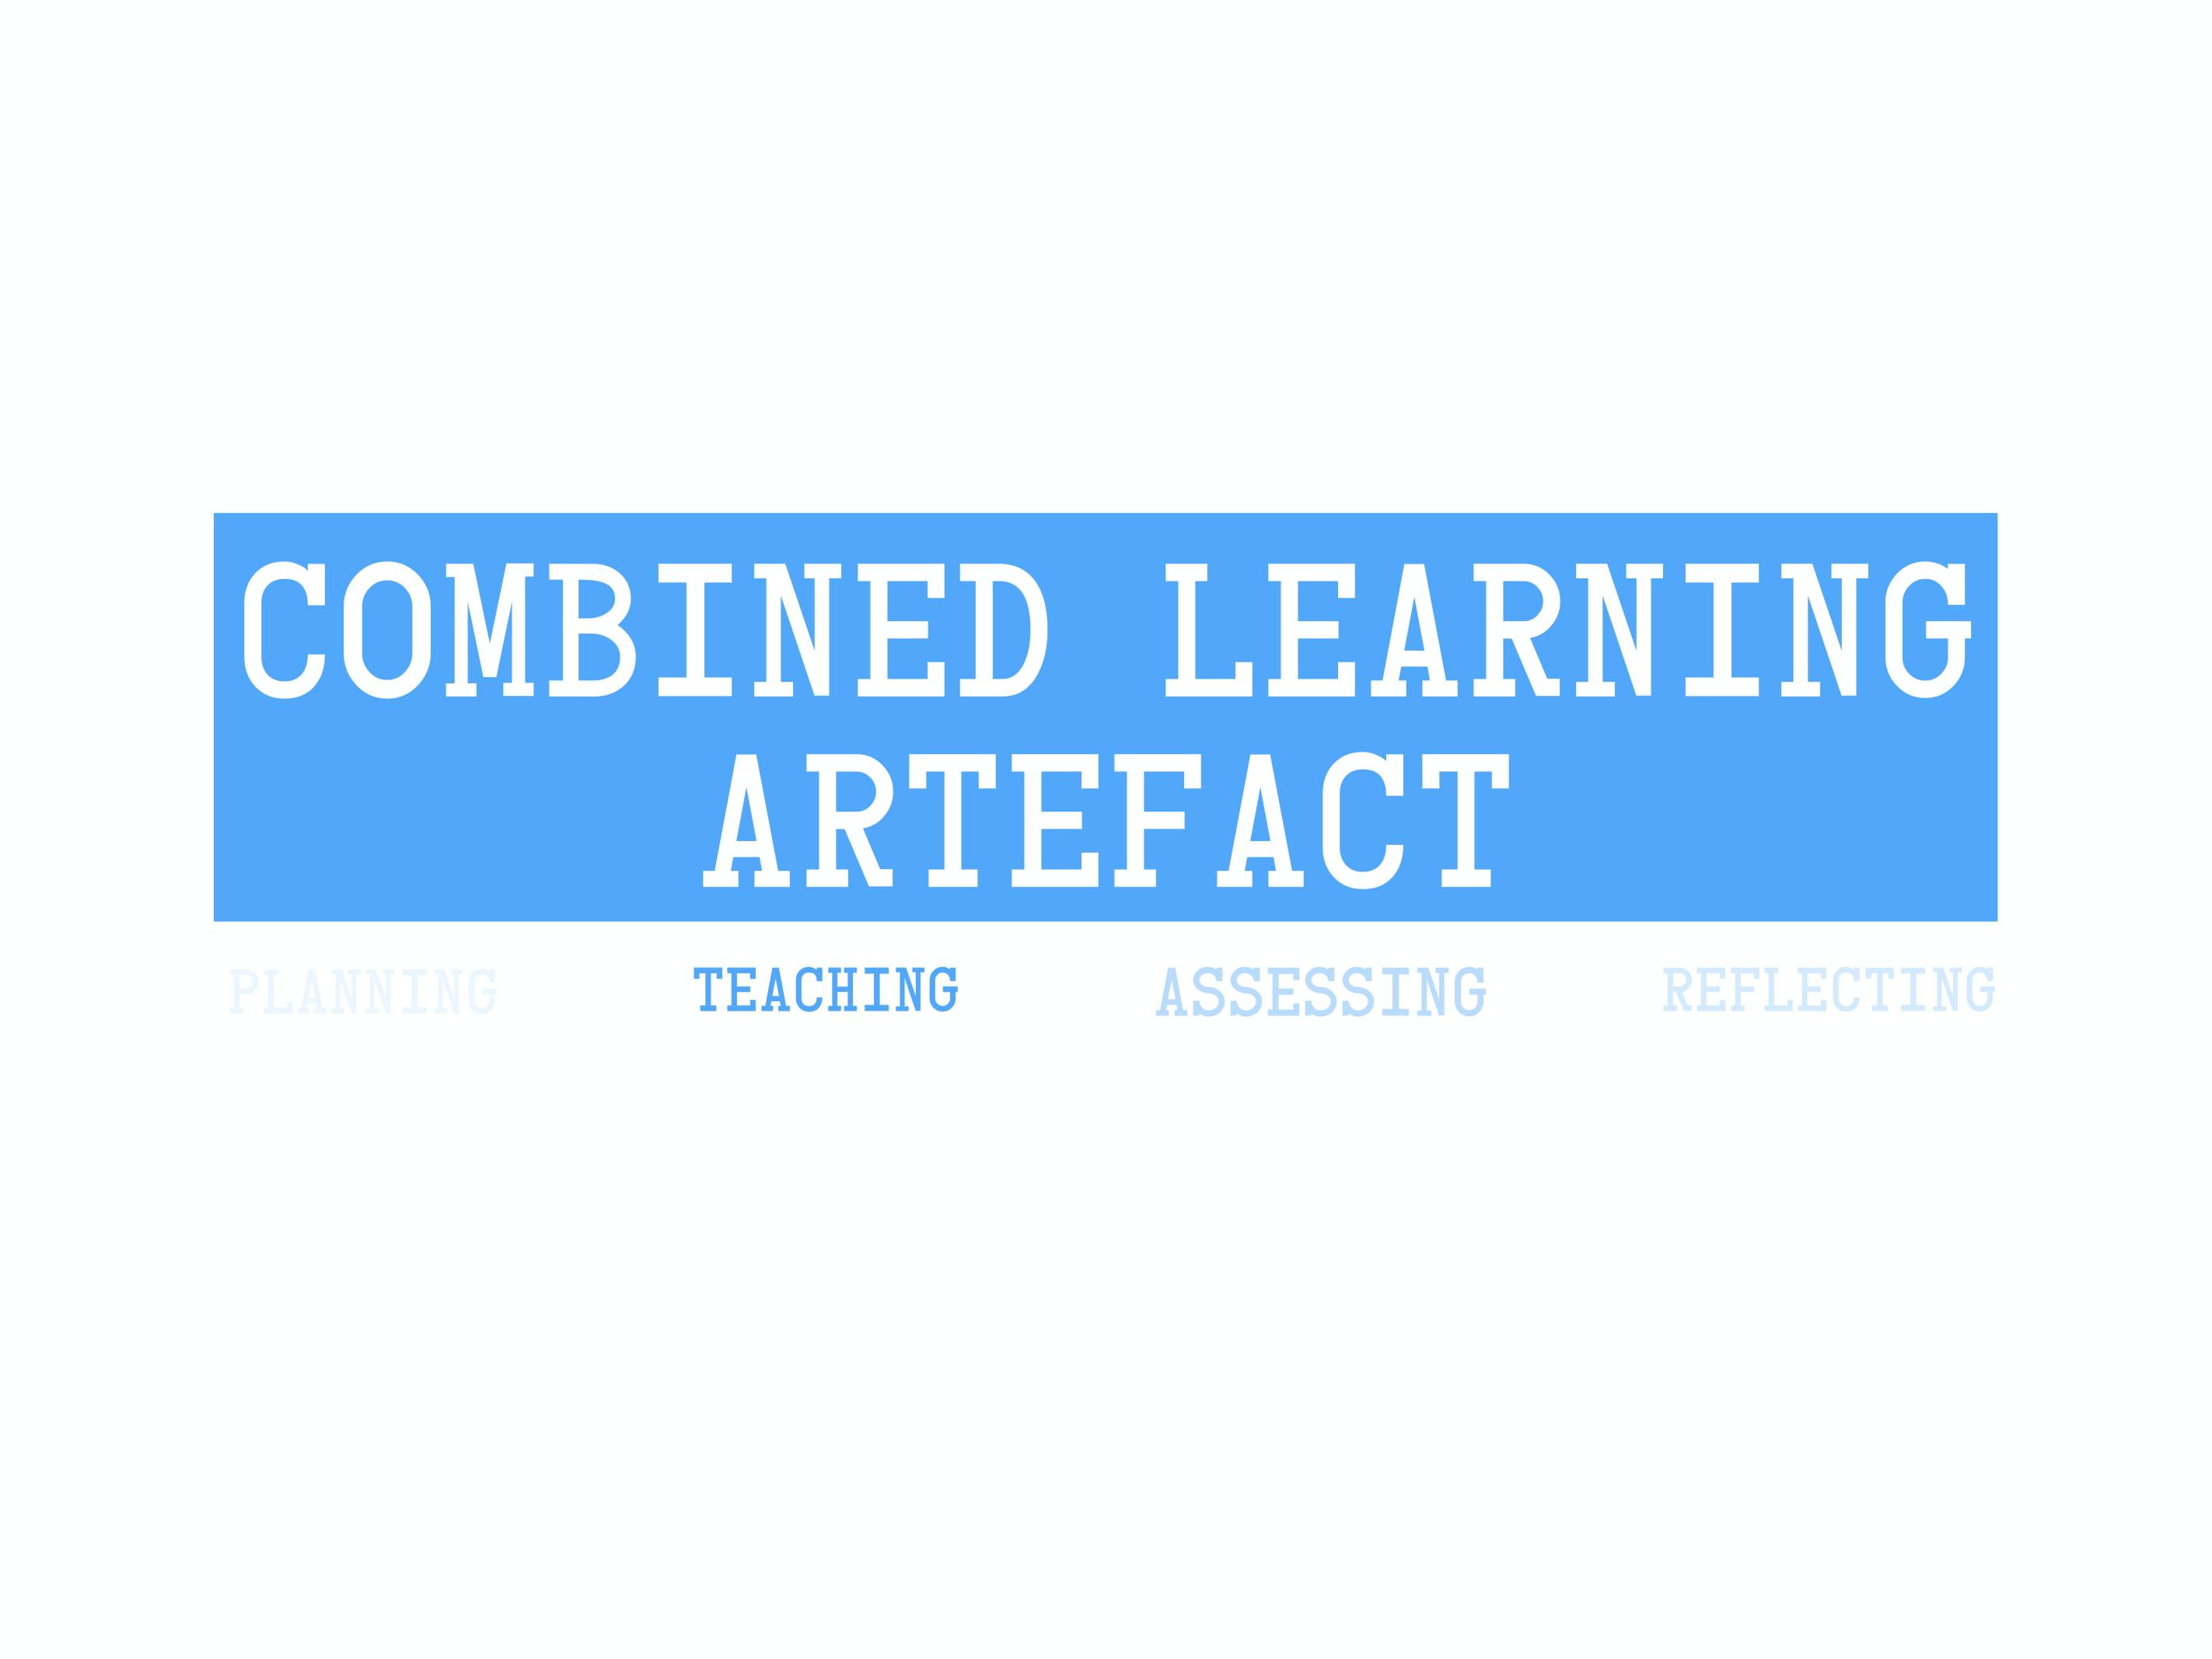 Niamh O'Toole Teaching 2017-01